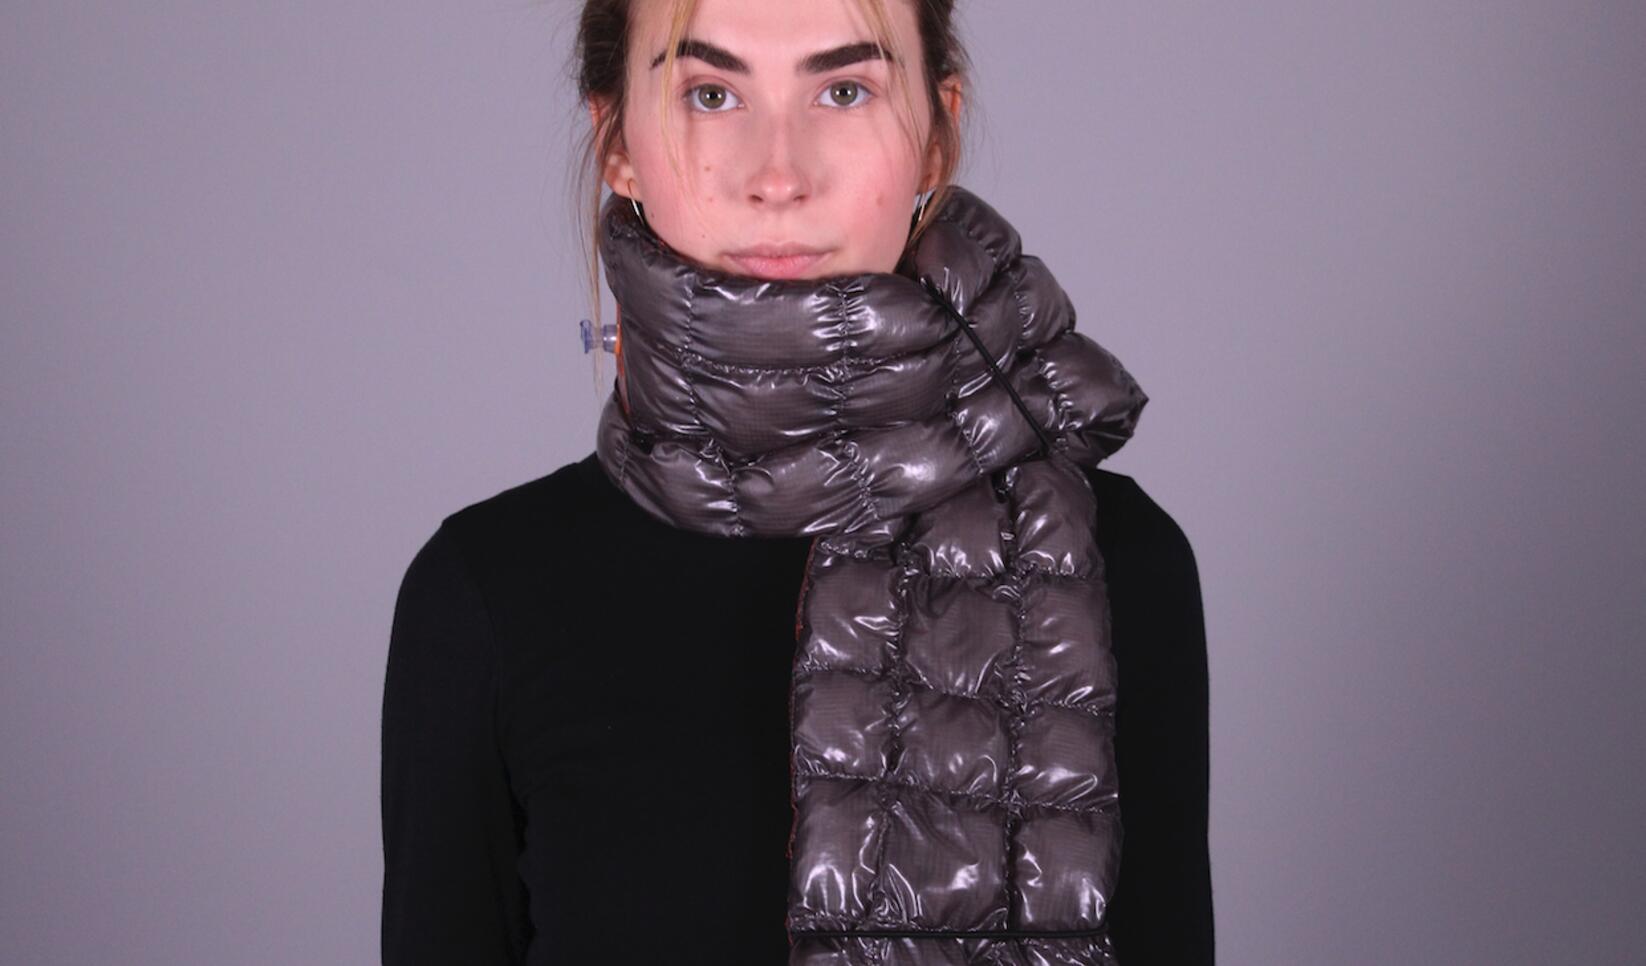 Model wearing an inflatable scarf product design. ; Zachary Wegscheid